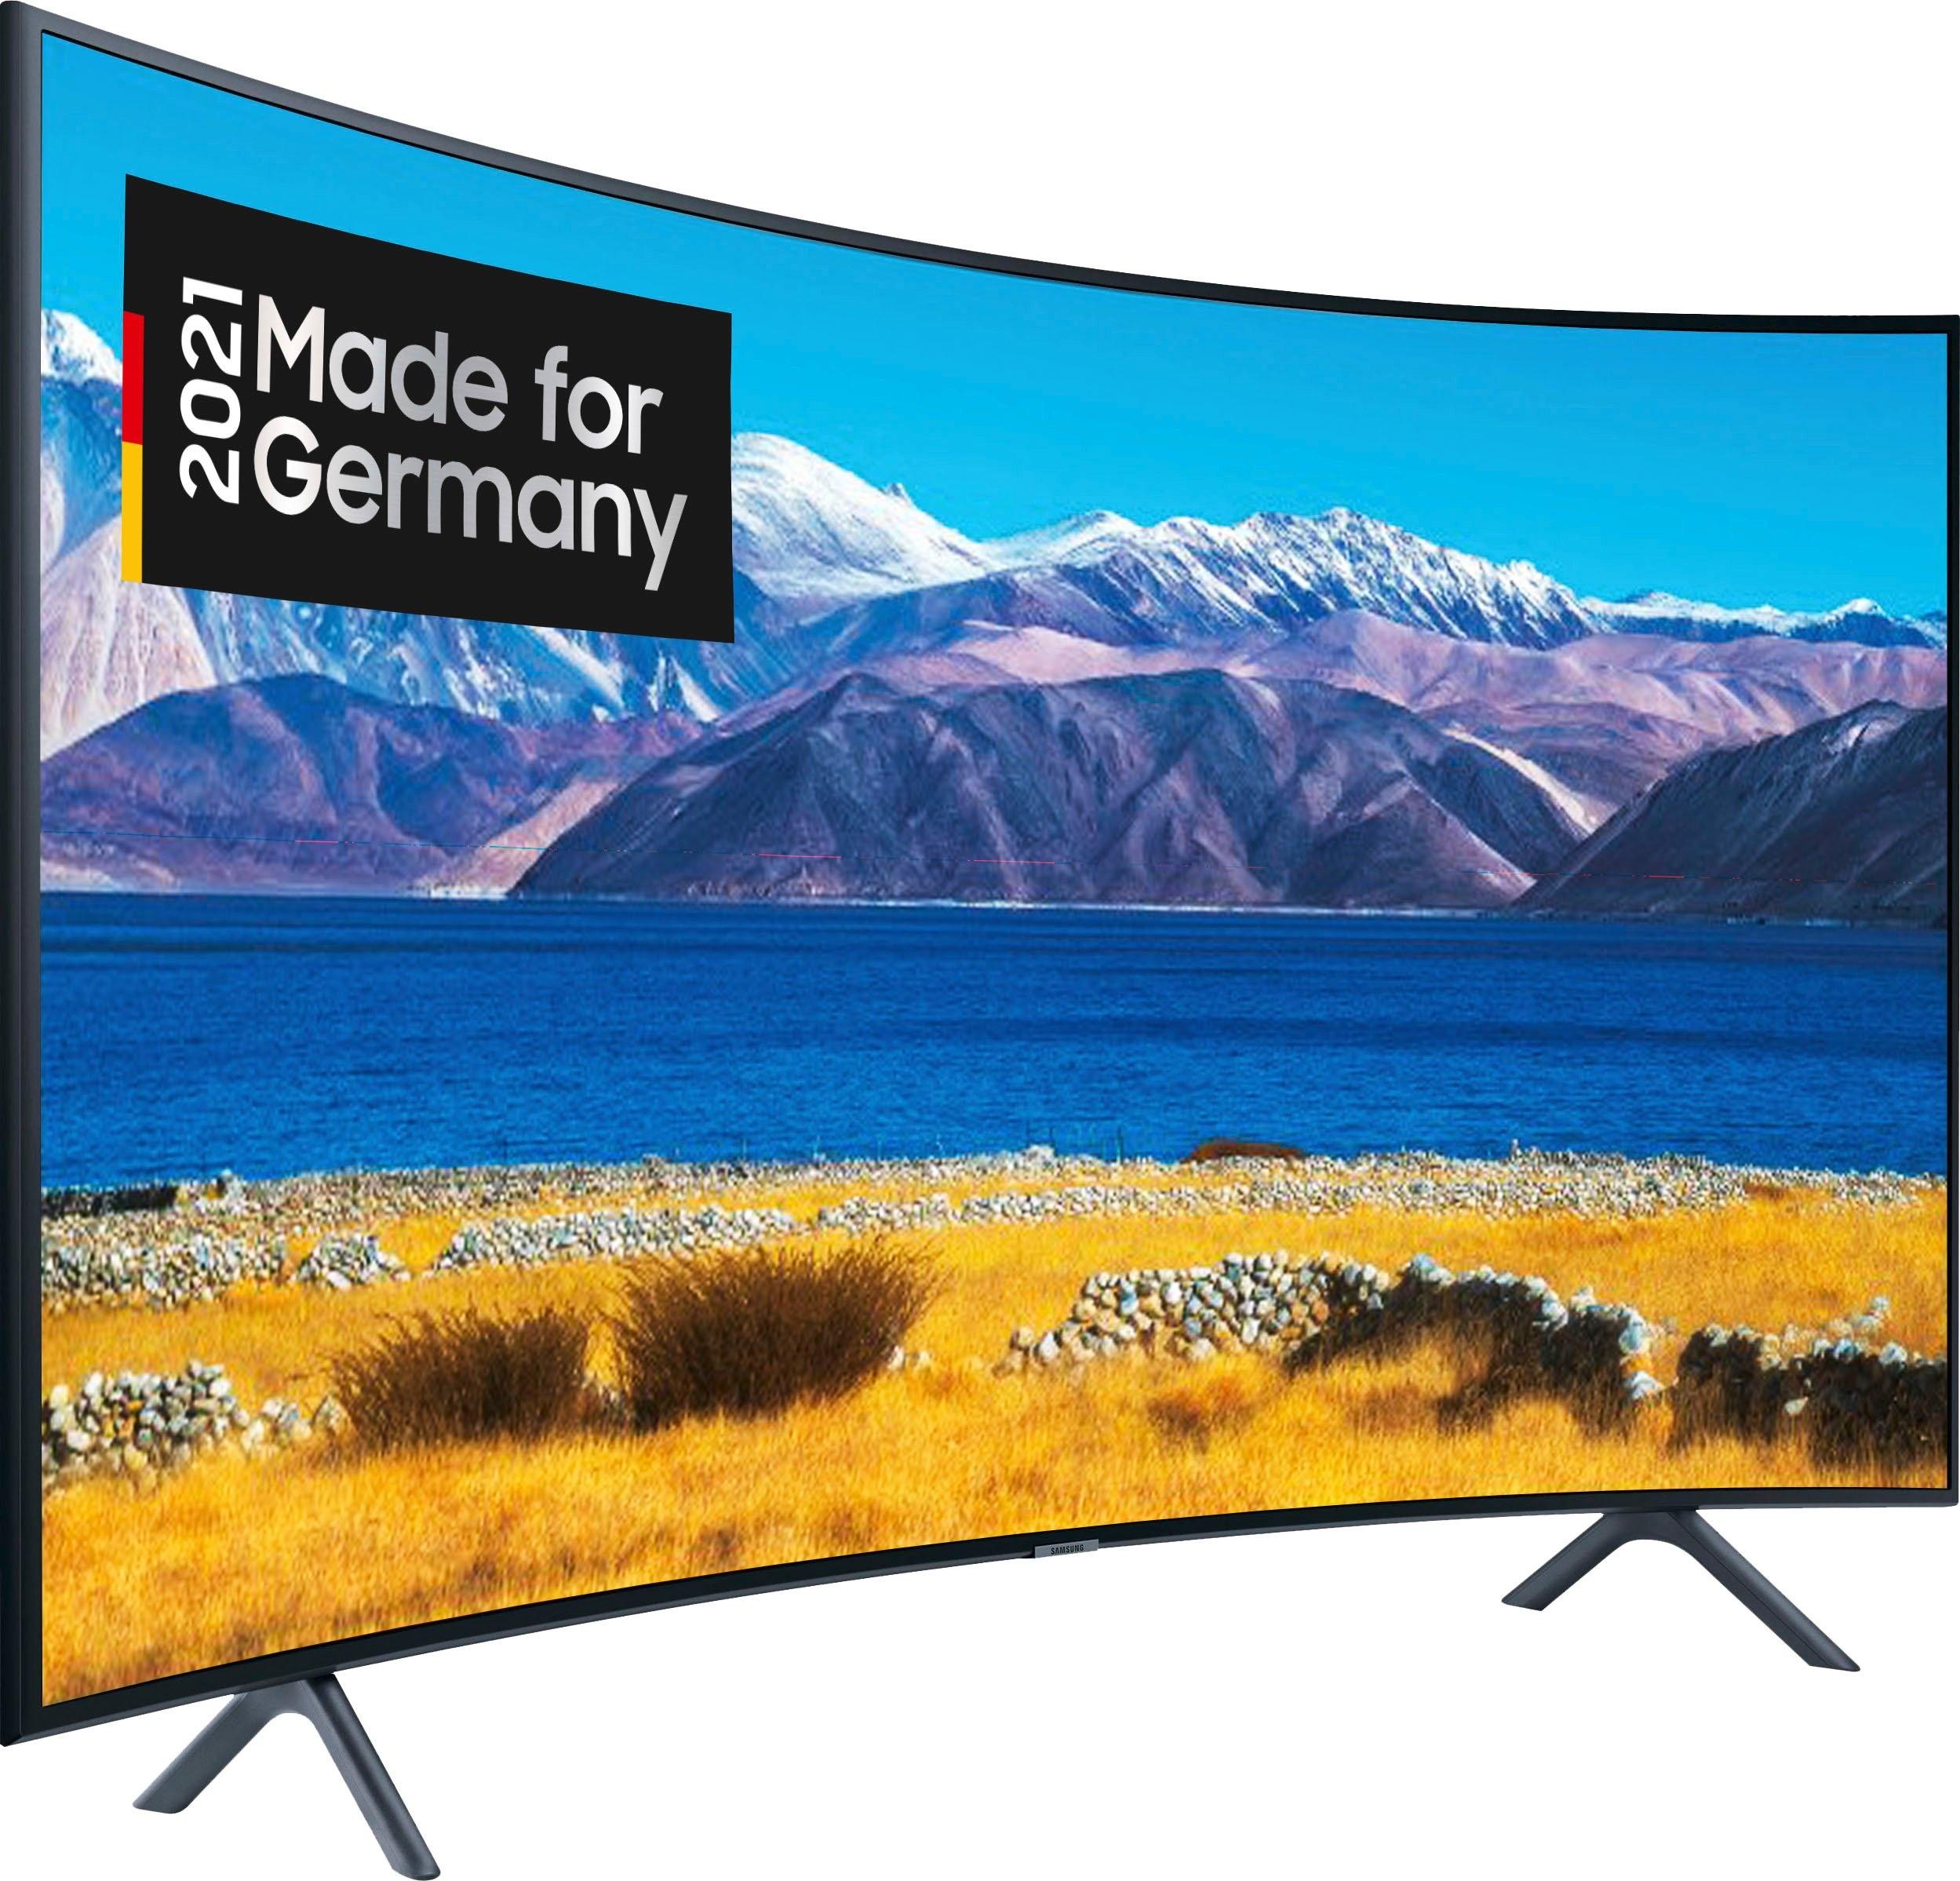 Samsung Curved LED-TV GU65TU8379U, 163 cm / 65